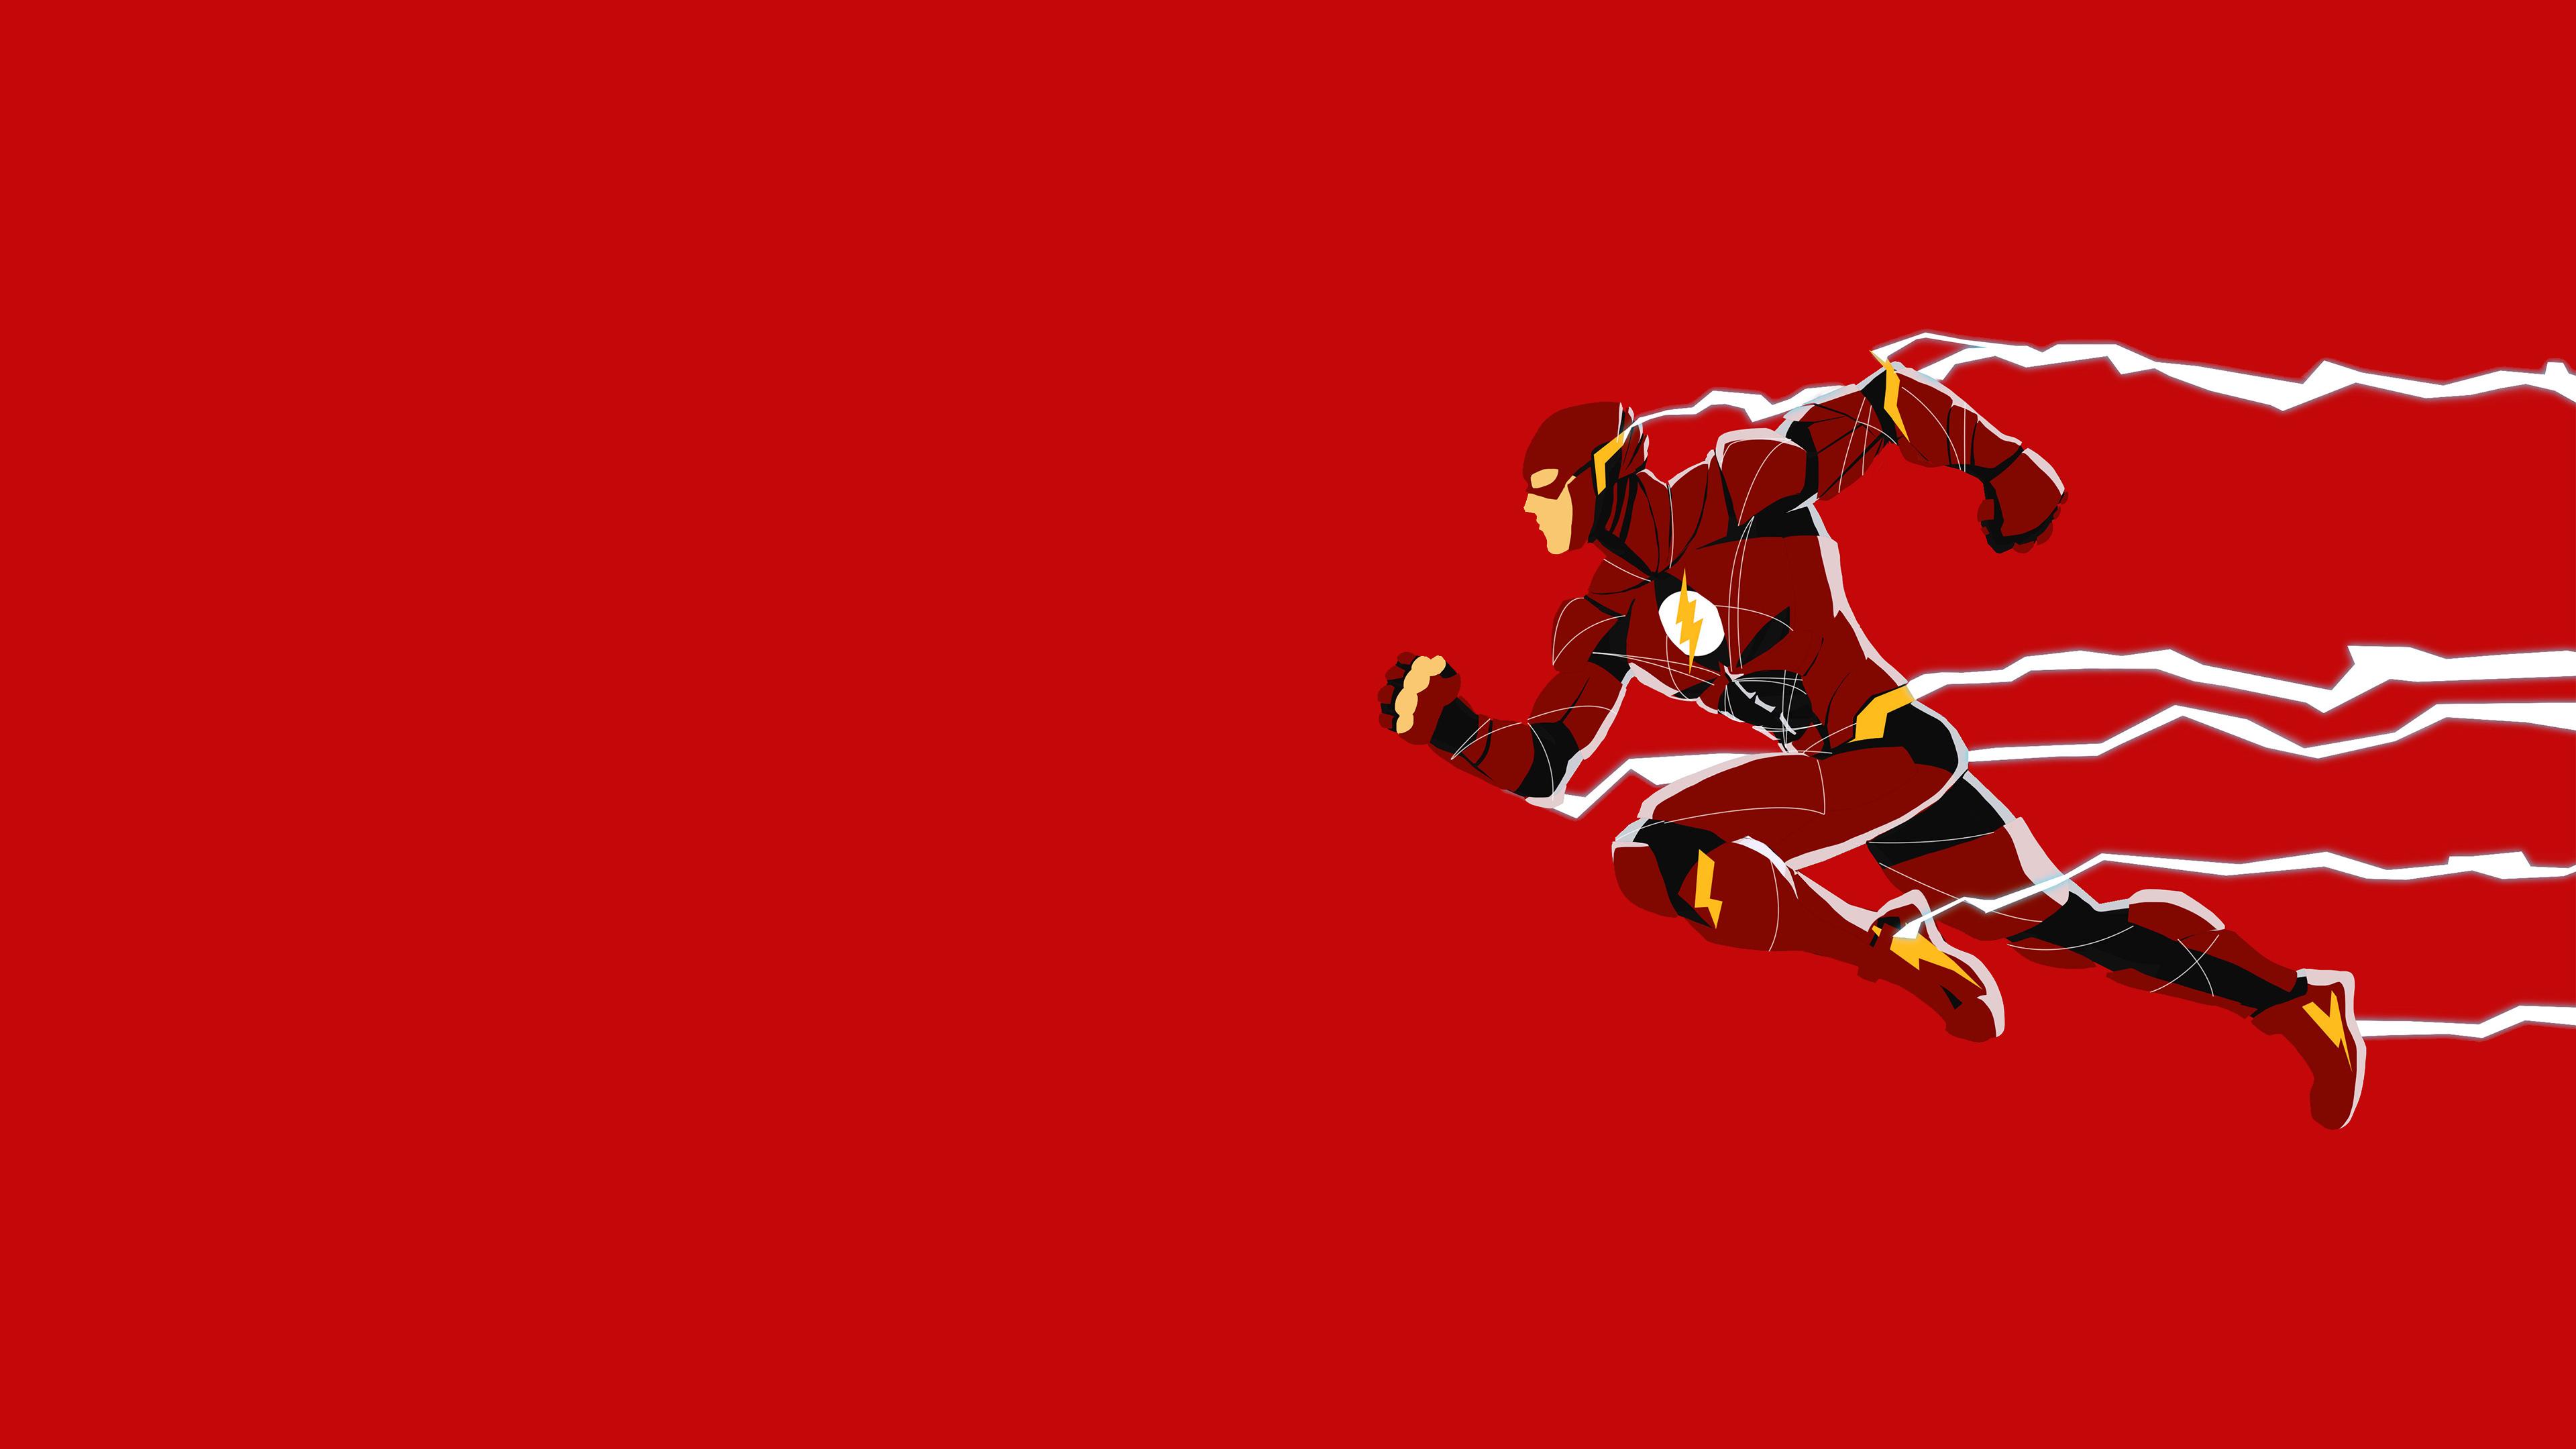 Justice League Flash Minimalism, HD Superheroes, 4k ...